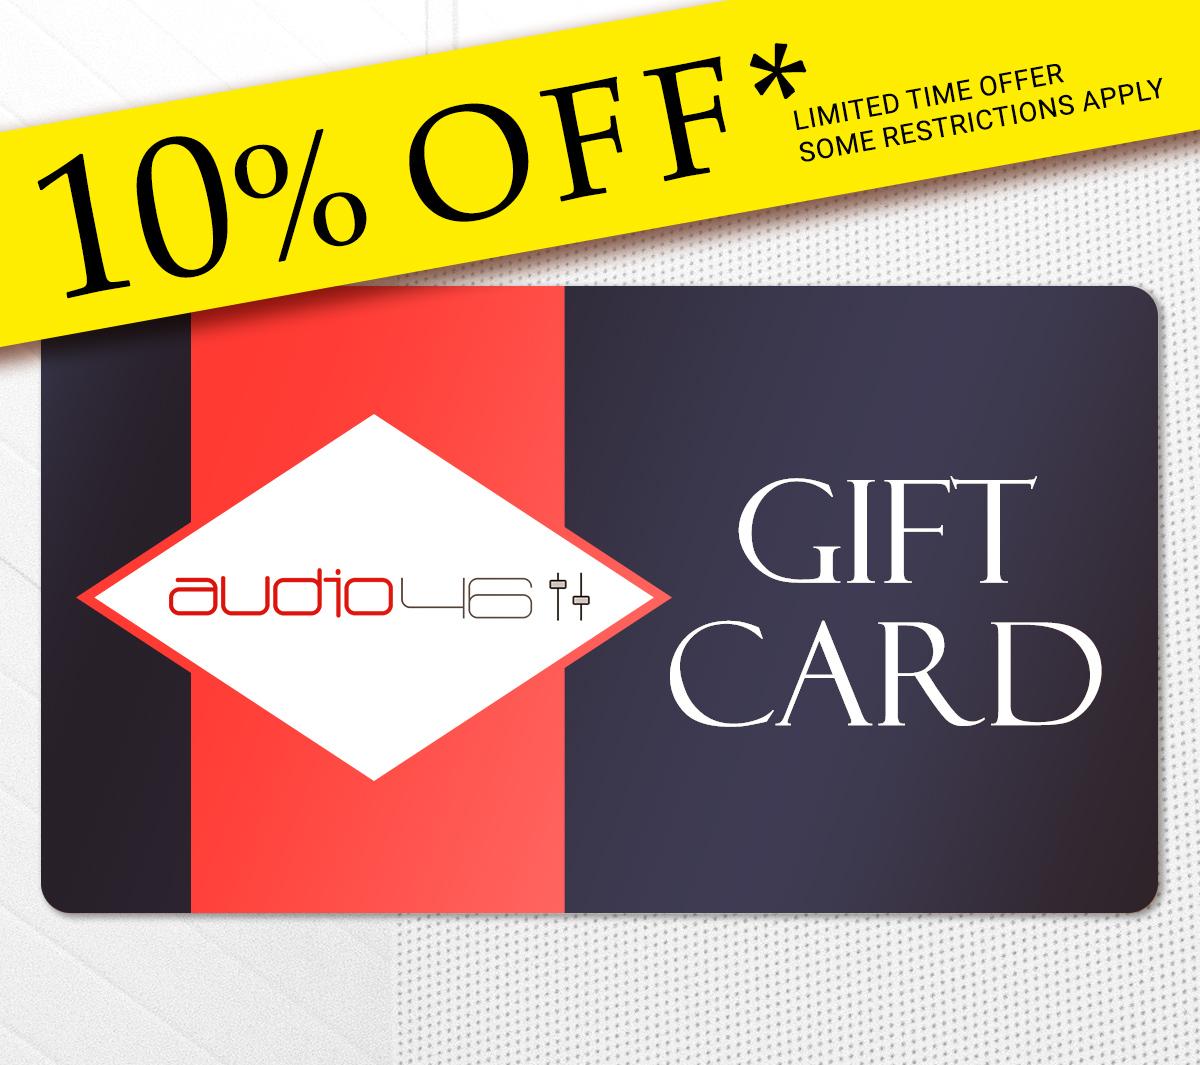 audio46 gift card sale 10percent.jpg